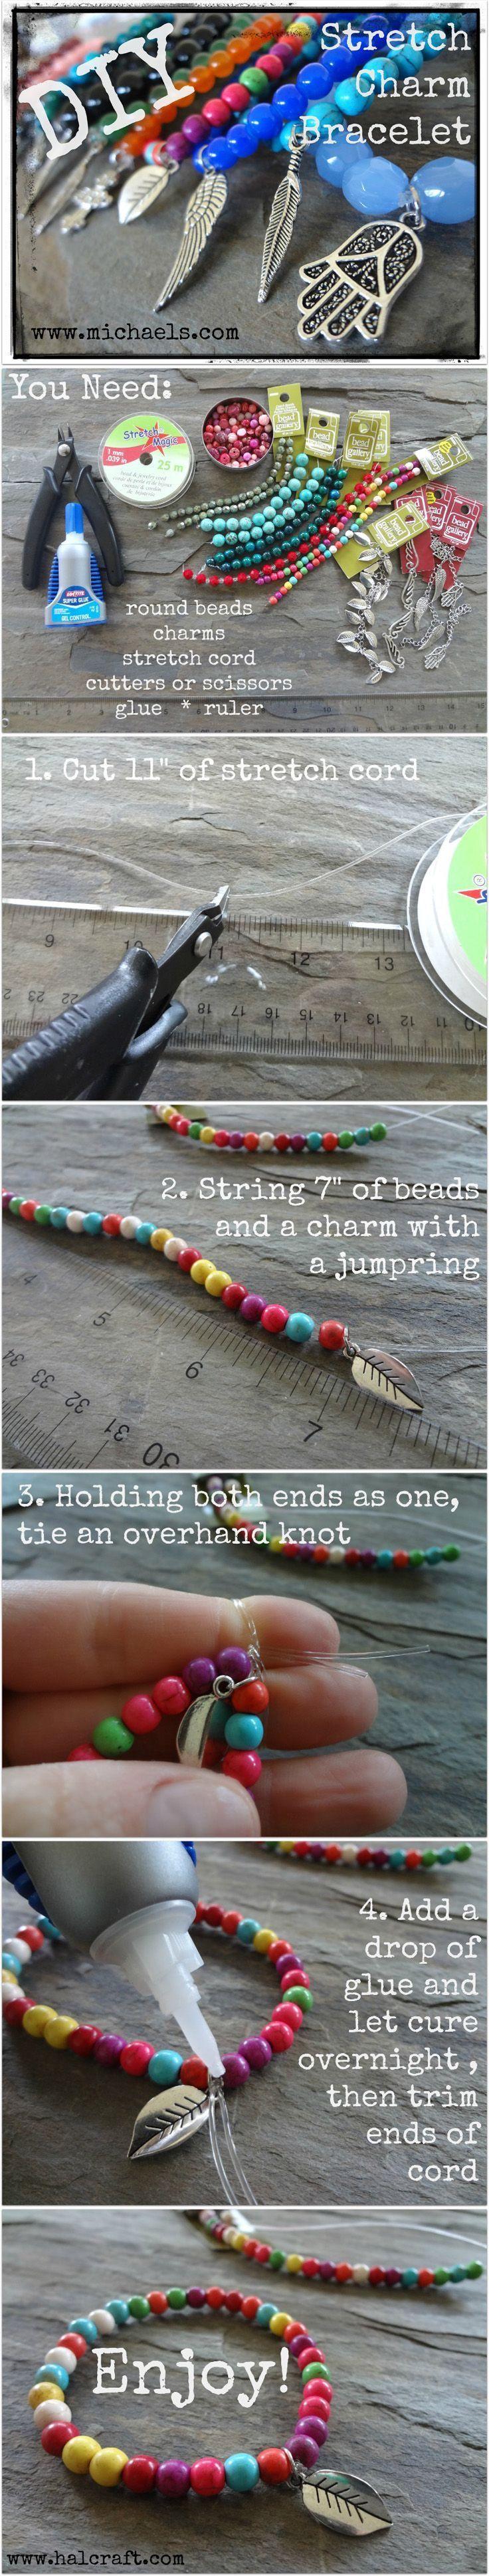 best bracelets images on pinterest